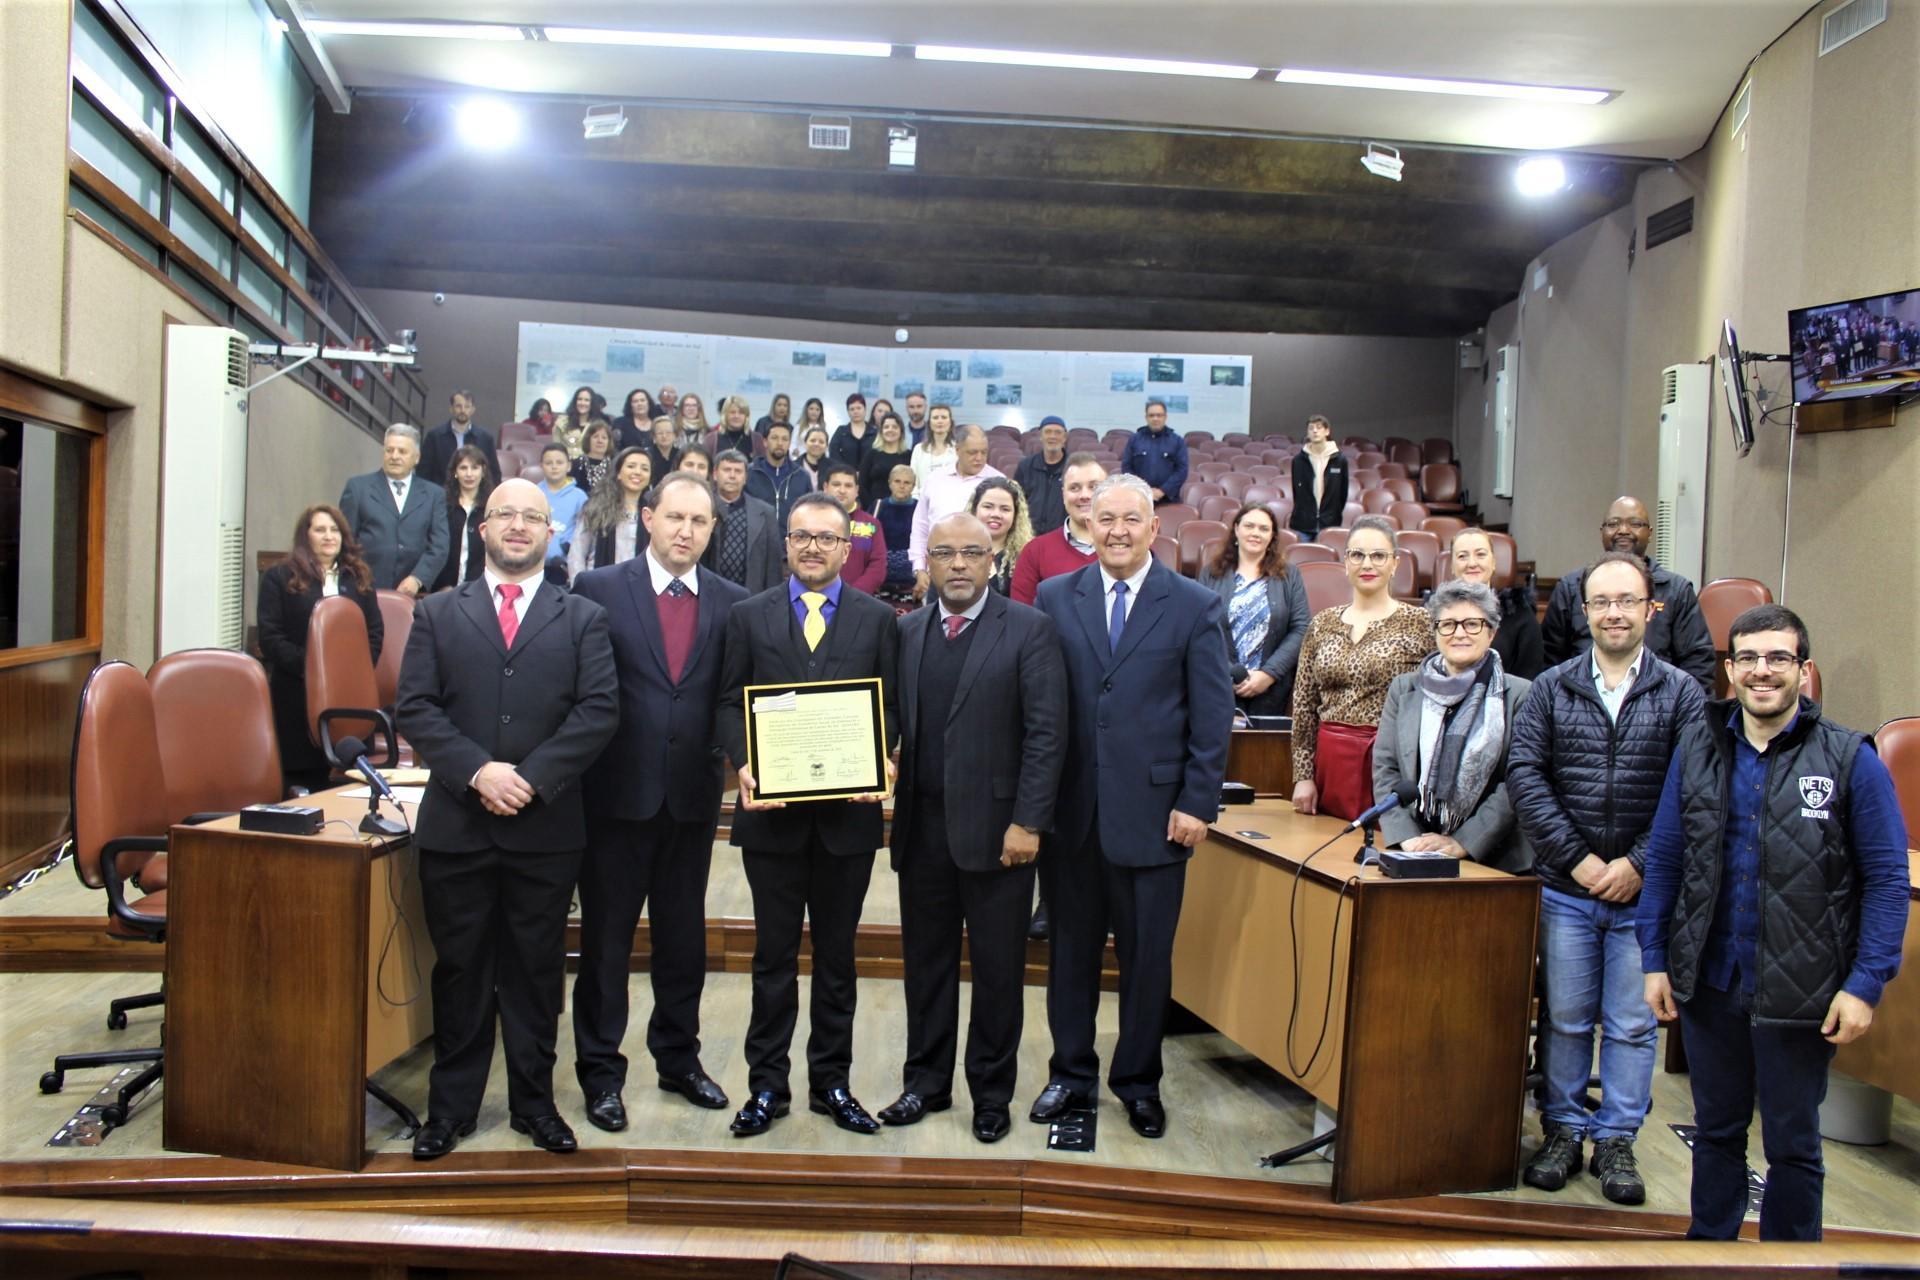 Senalba recebe homenagem do Legislativo caxiense